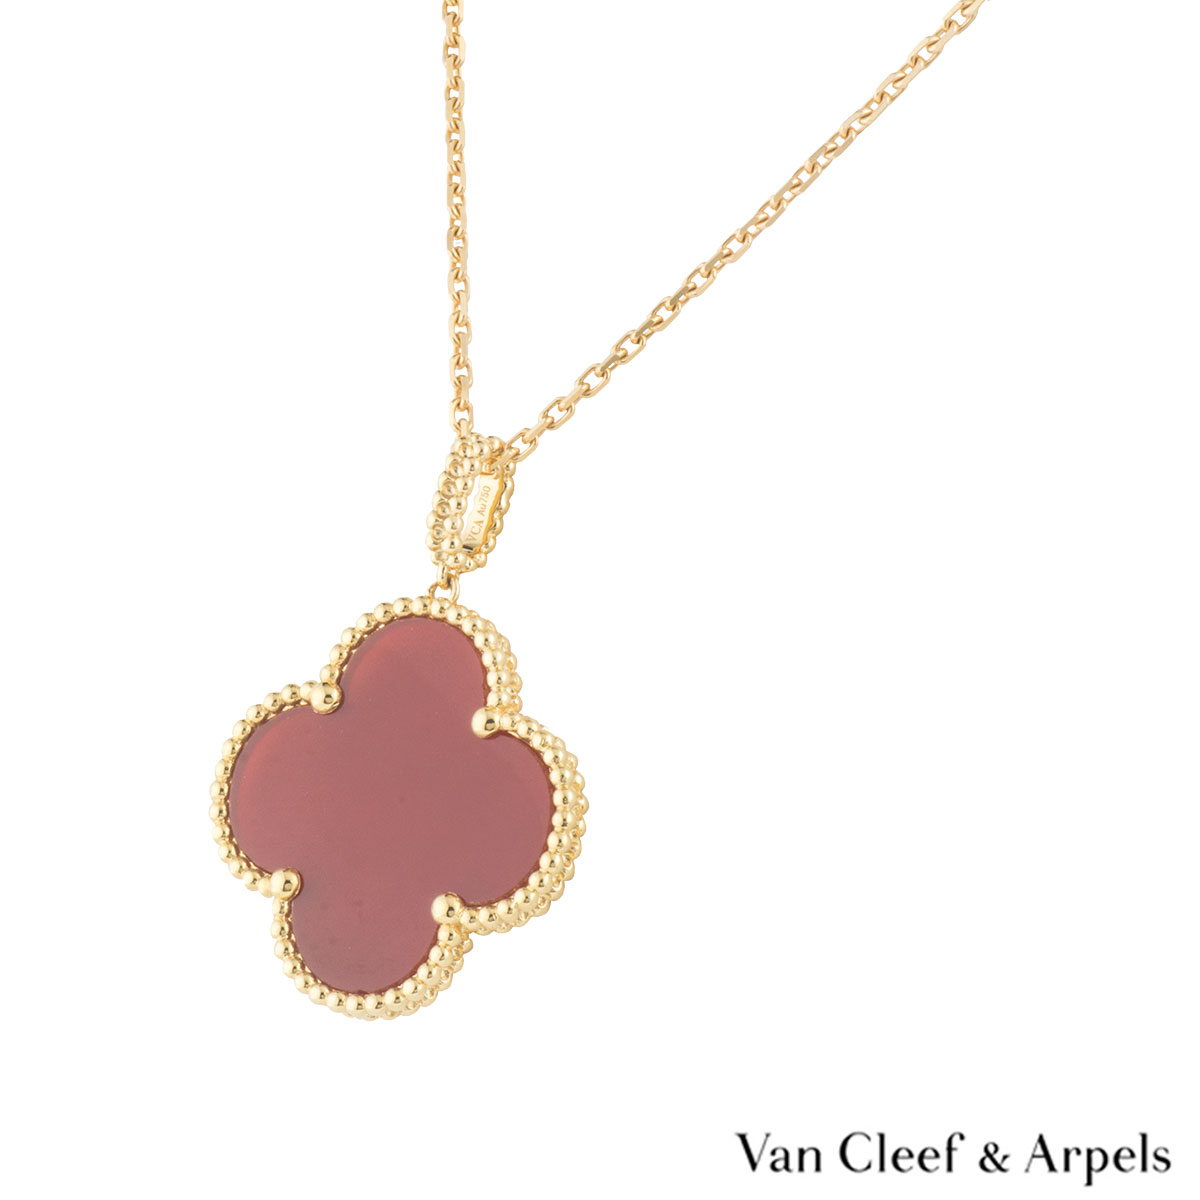 Van Cleef & Arpels Yellow Gold Carnelian Magic Alhambra Necklace VCARO49N00